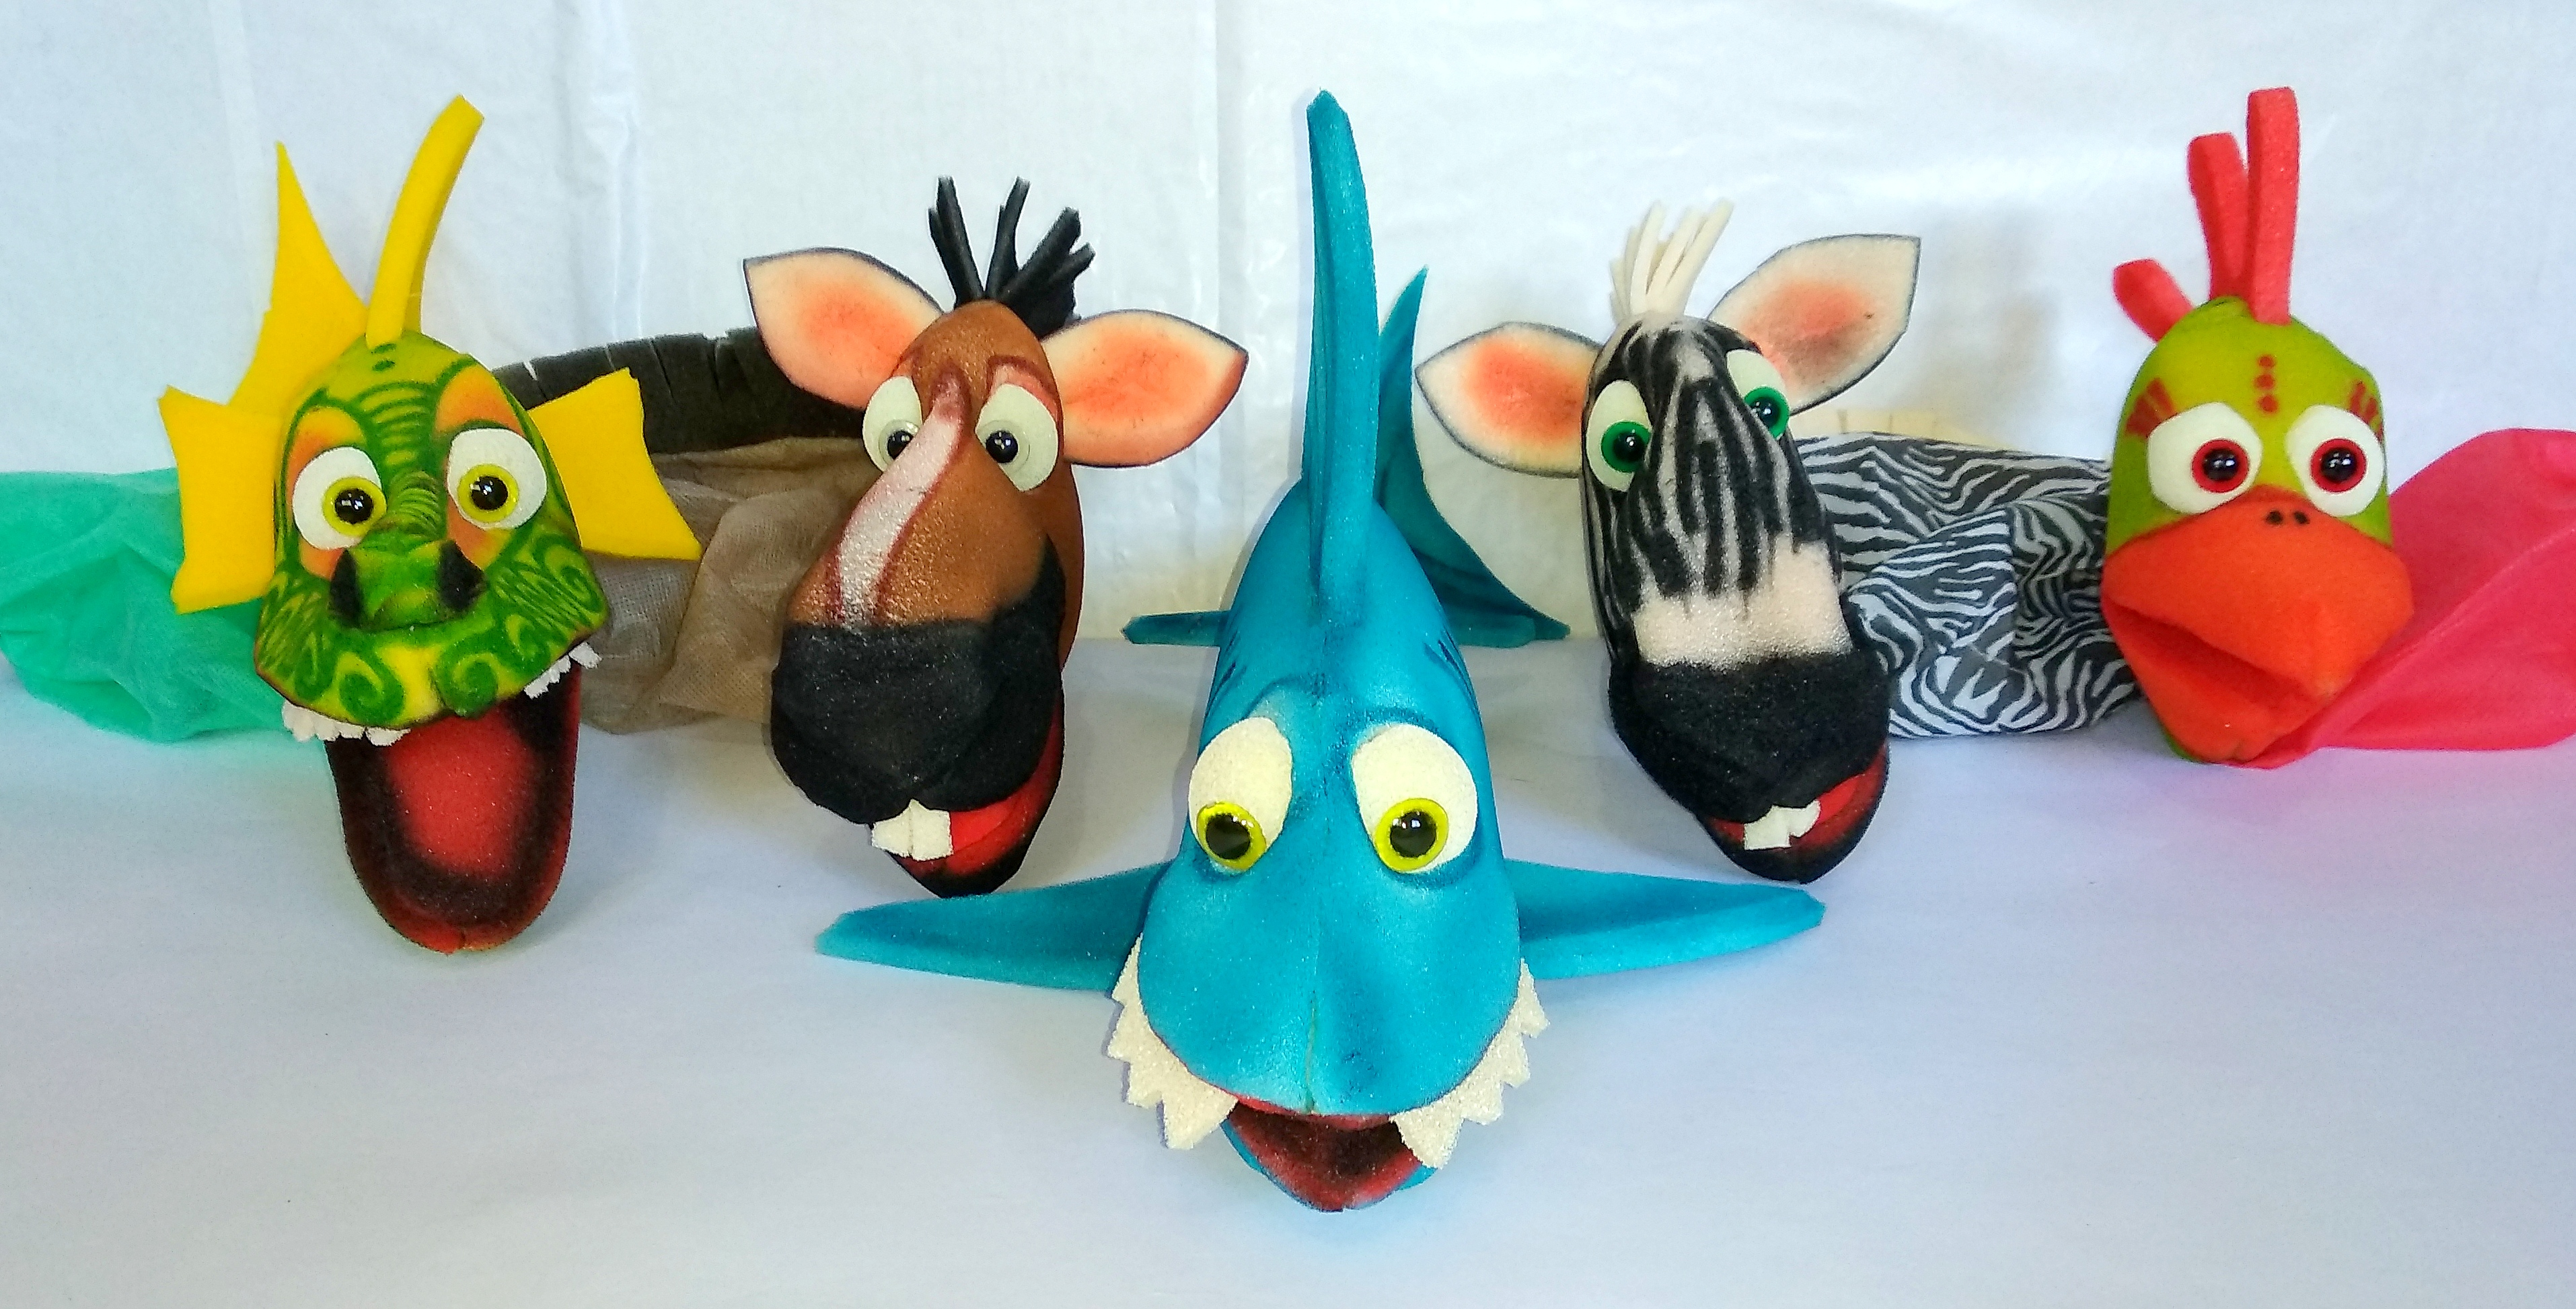 Títeres de goma espuma y manga de tela. Animalitos: Dragón (17x45 cm), Caballo (18x34 cm), Tiburón (20x47 cm), Cebra (22x36 cm) y Gallo (22x34 cm).